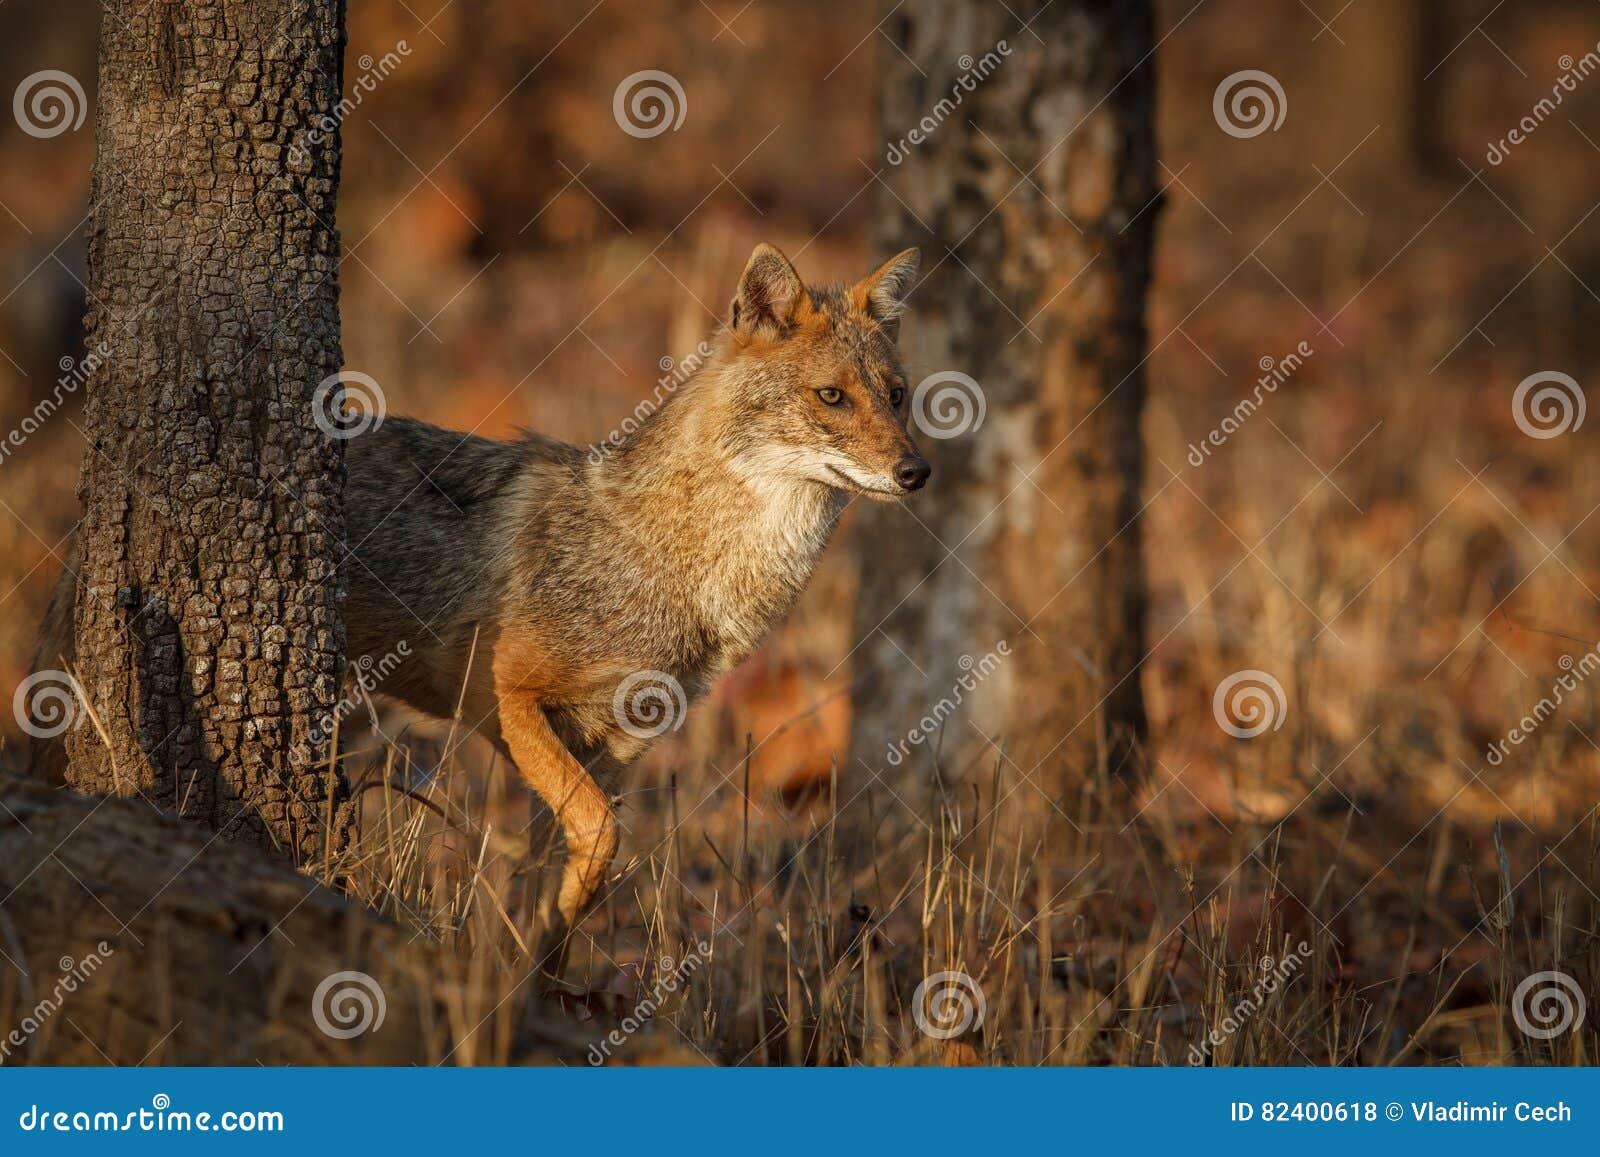 Beautiful golden jackal in nice soft light in India